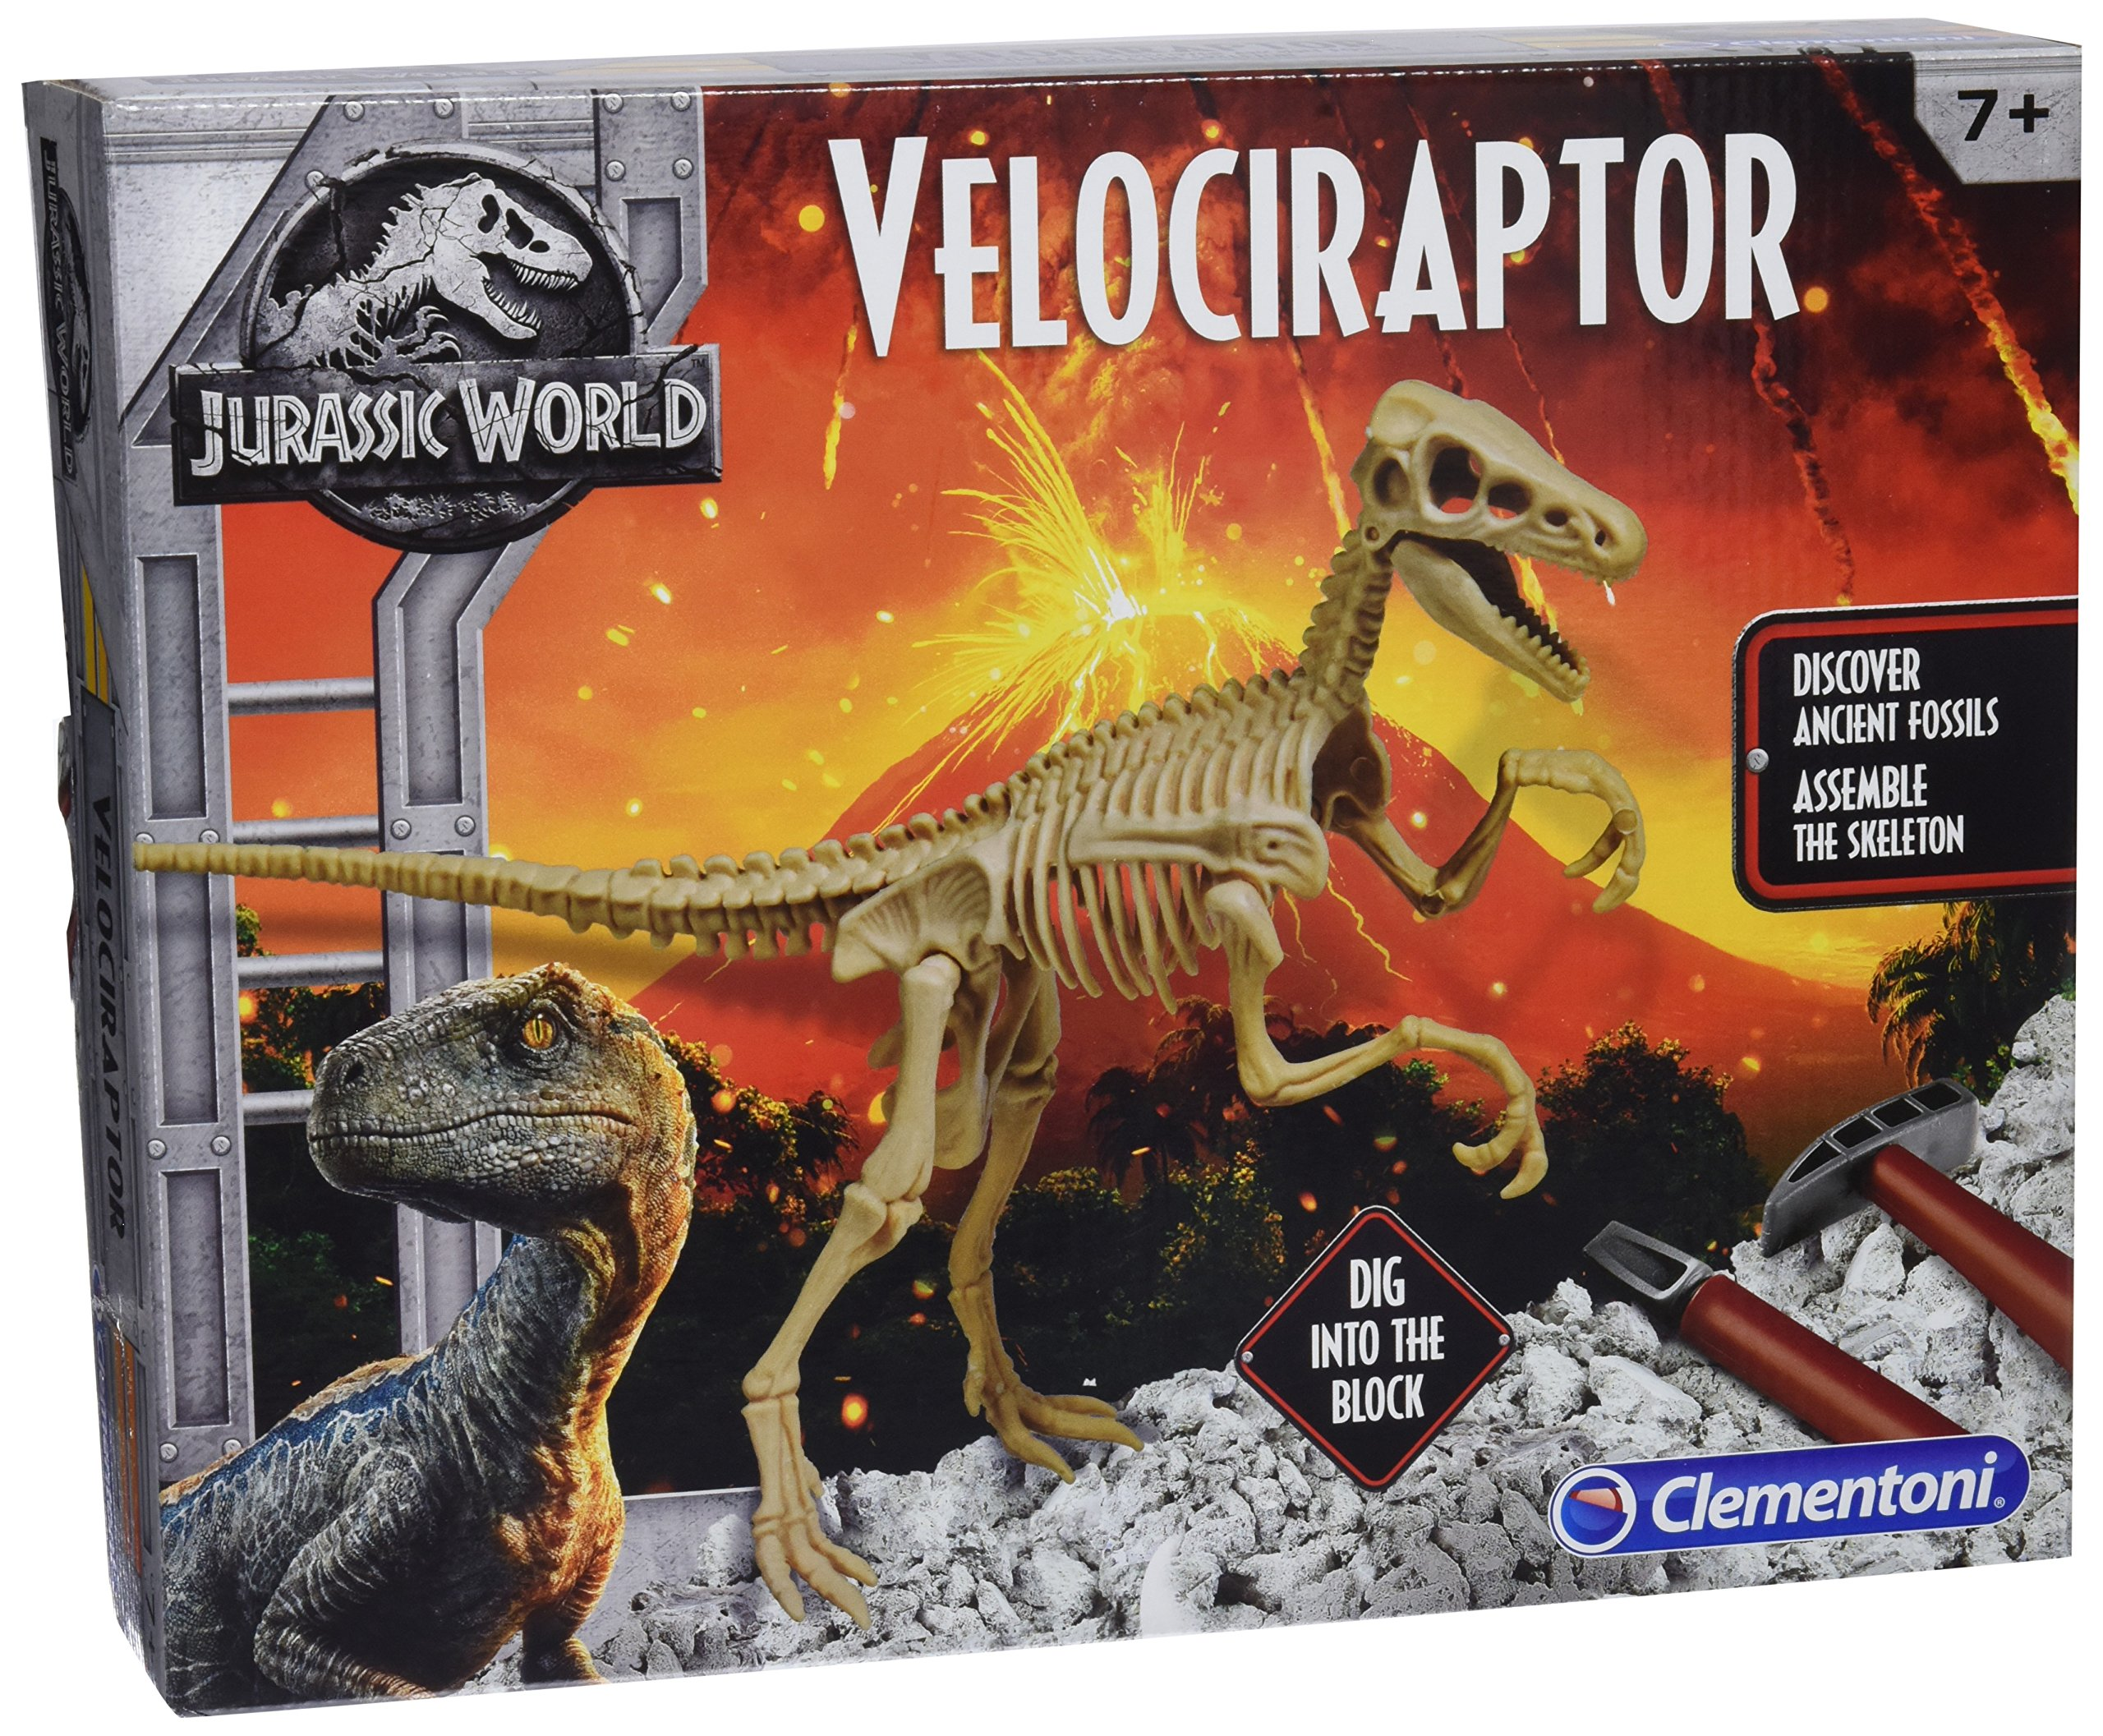 Clementoni 19063 Jurassic World Velociraptor Dig Set, Multicolored, Norme